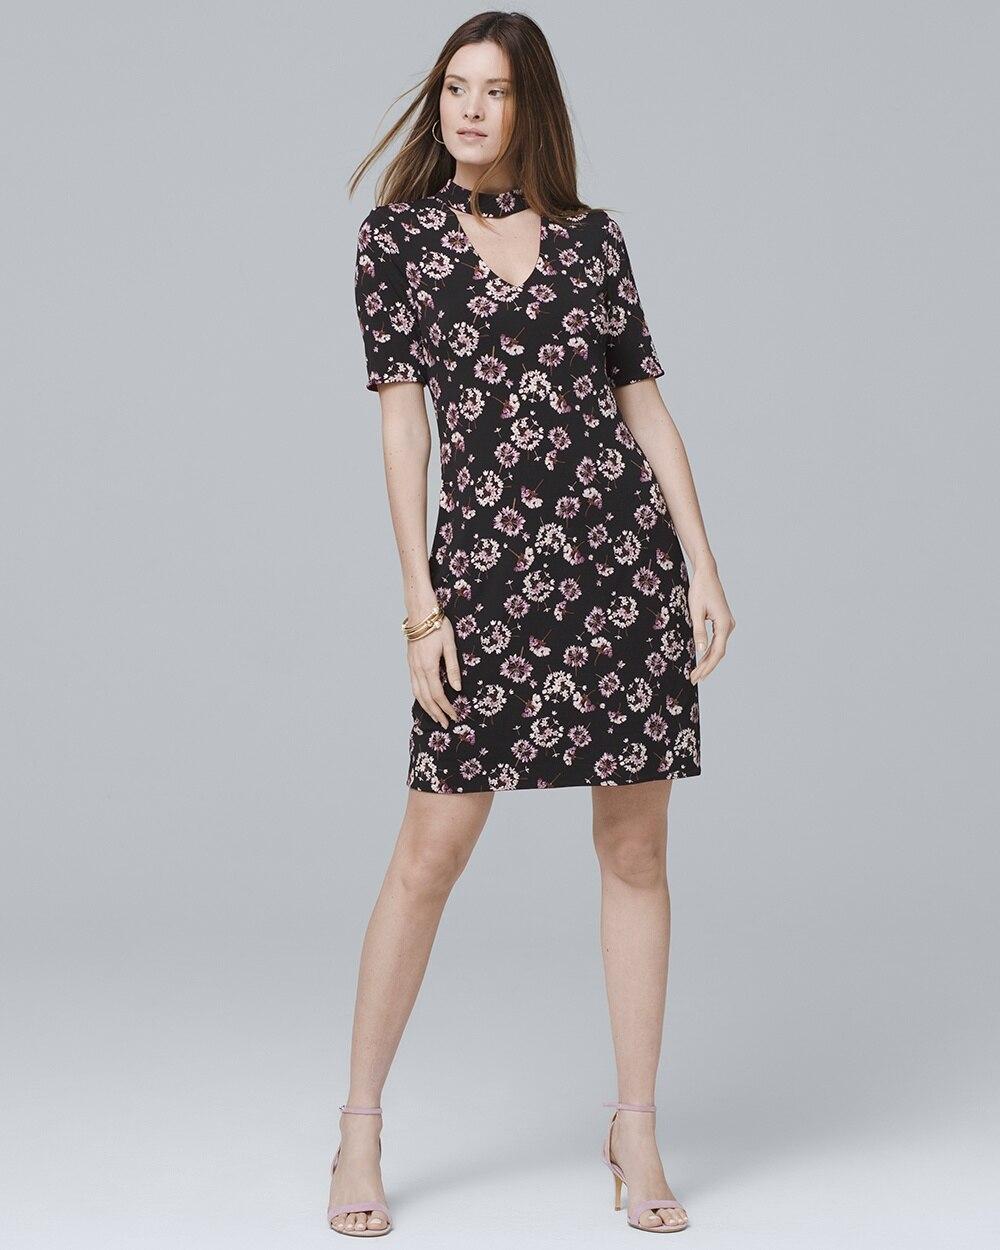 8156ea4dc7 Reversible Short-Sleeve Choker Knit Shift Dress - White House Black Market